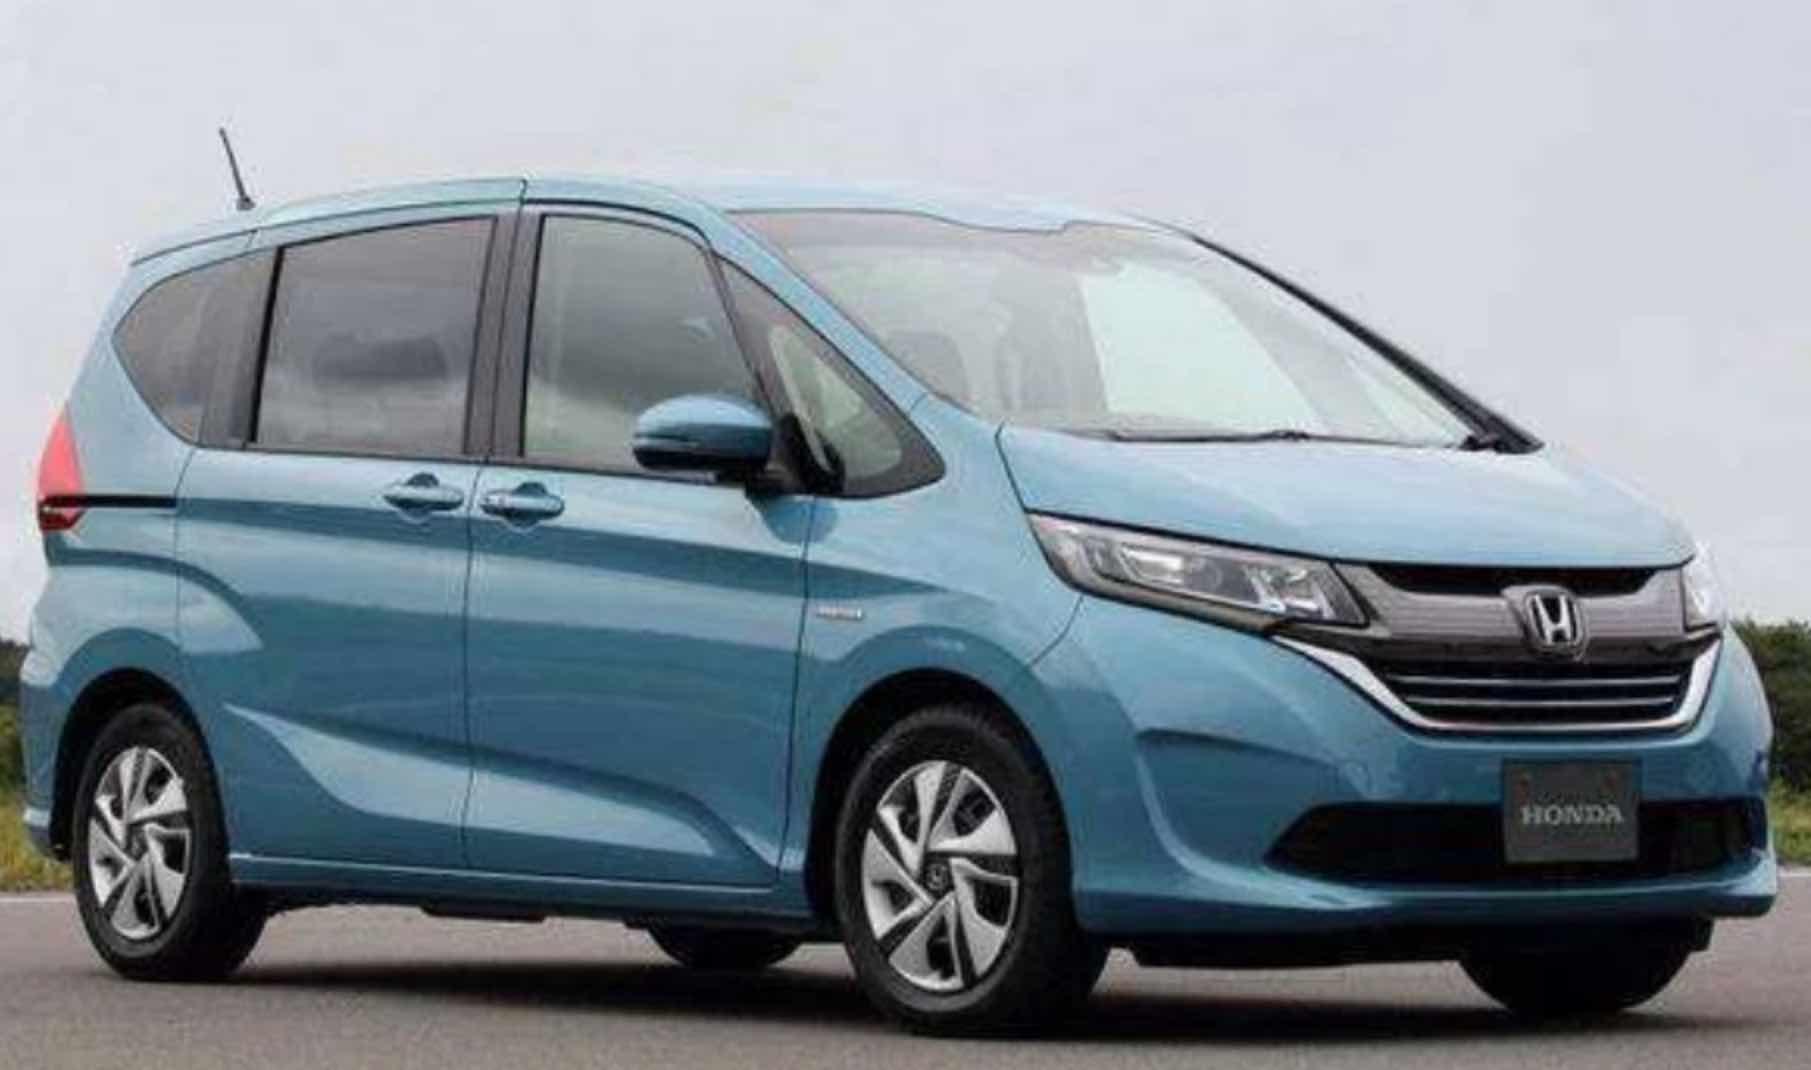 Honda's entry-level MPV will be made in china